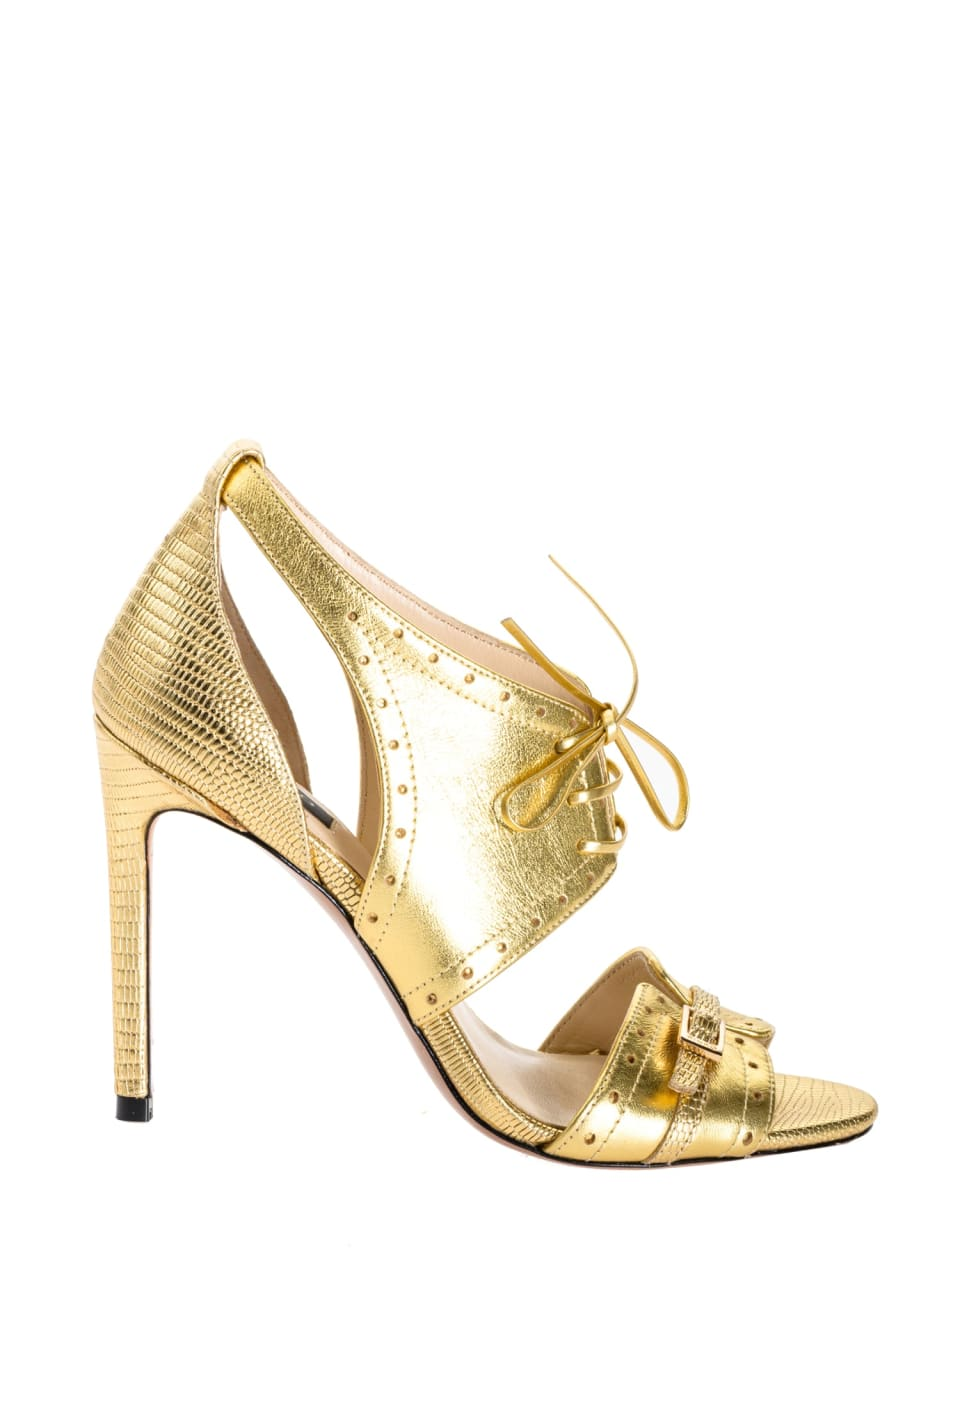 Sandalias de piel laminada dorada